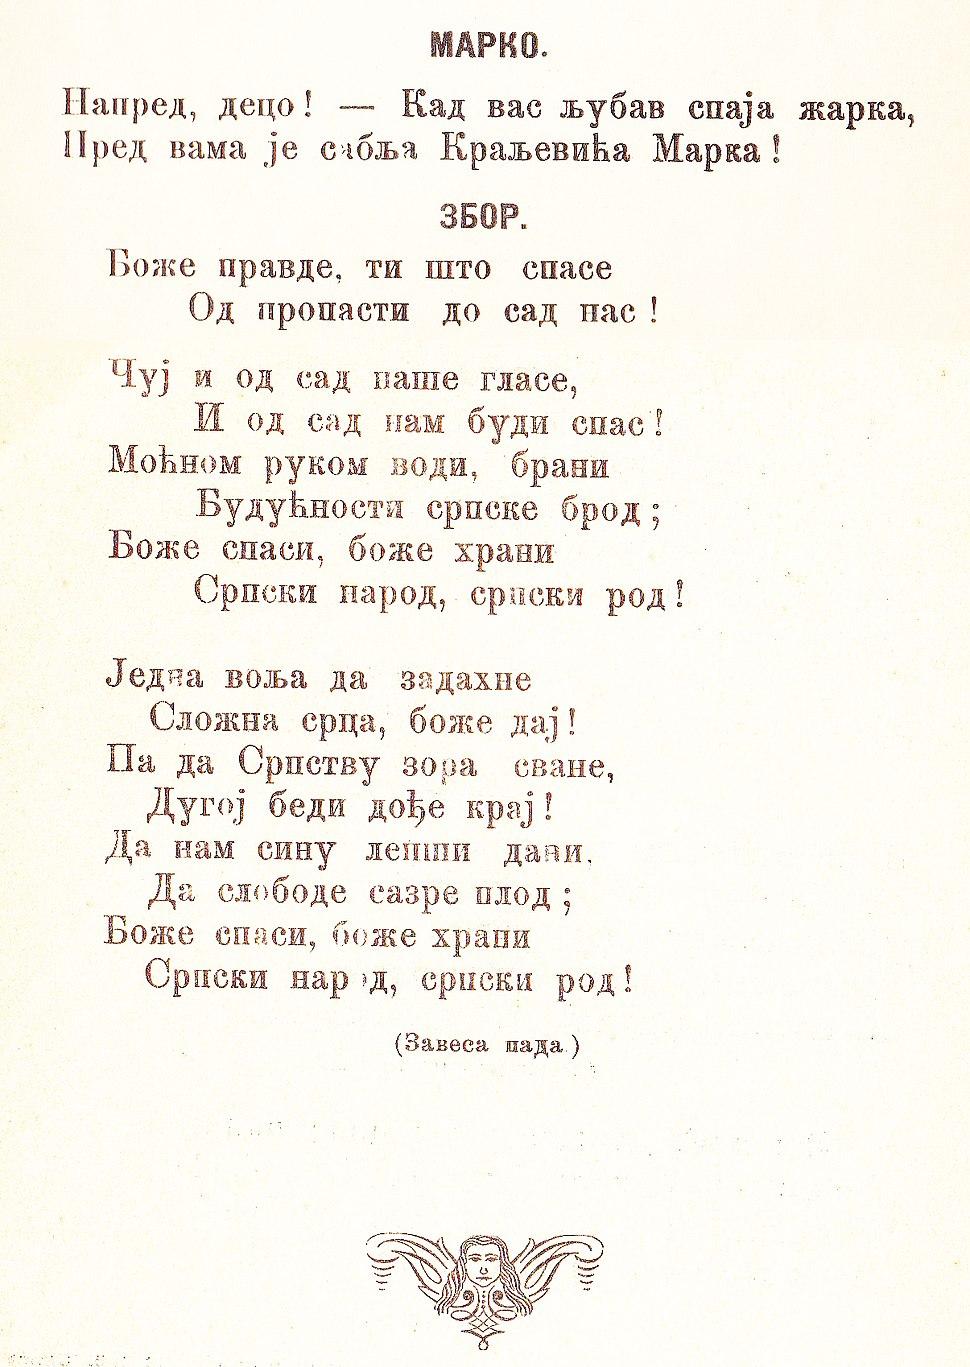 Original text of the Serbian Anthem